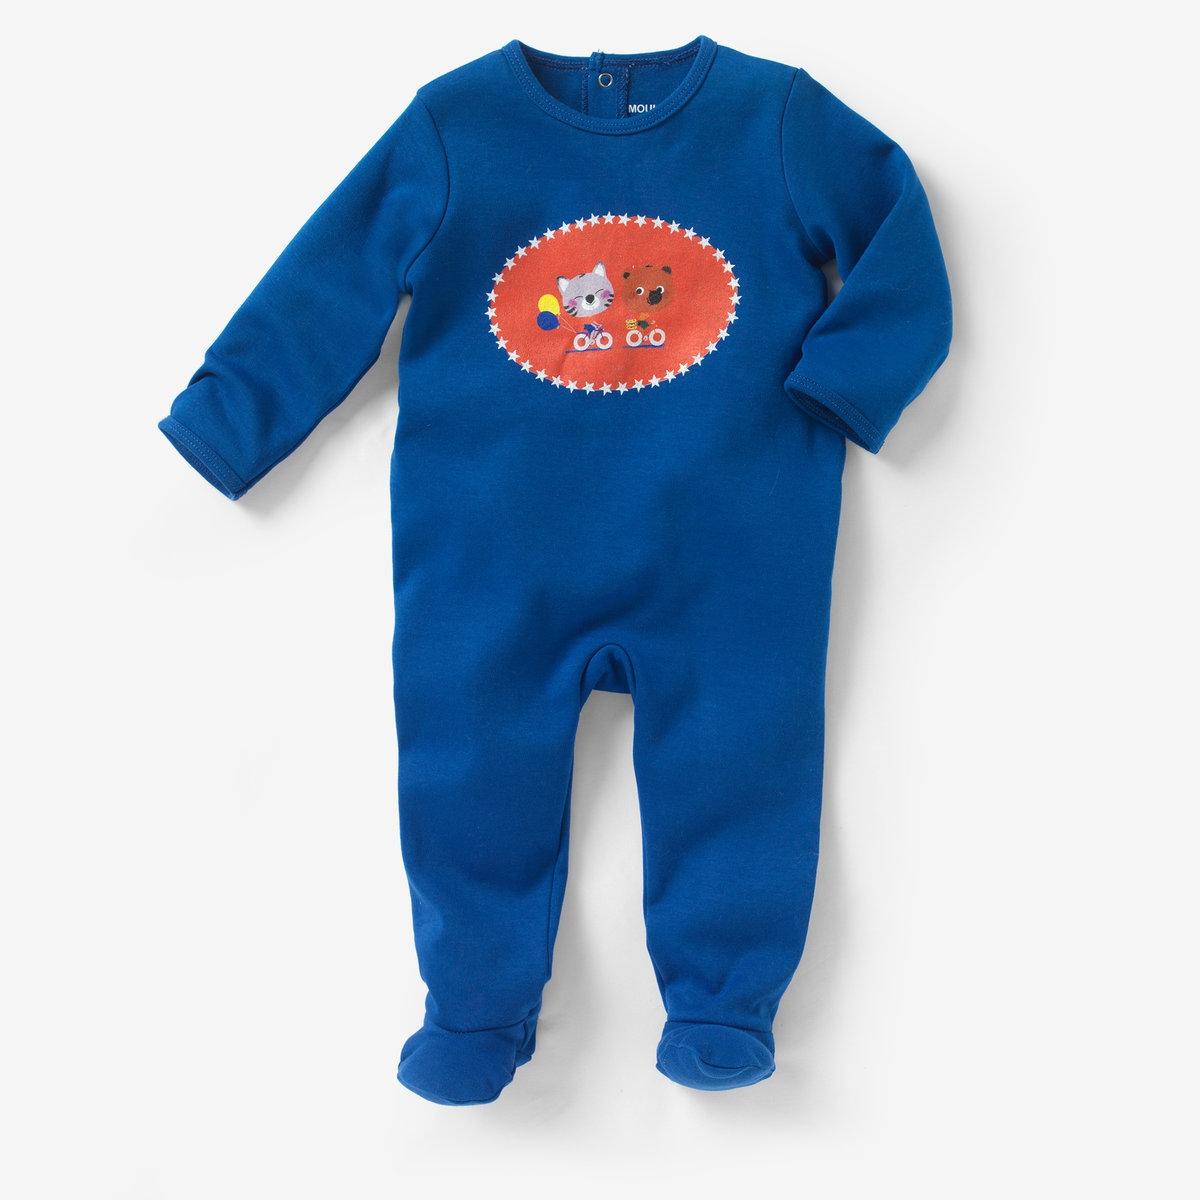 Пижама из хлопка интерлок MOUK, 0 месяцев - 3 года